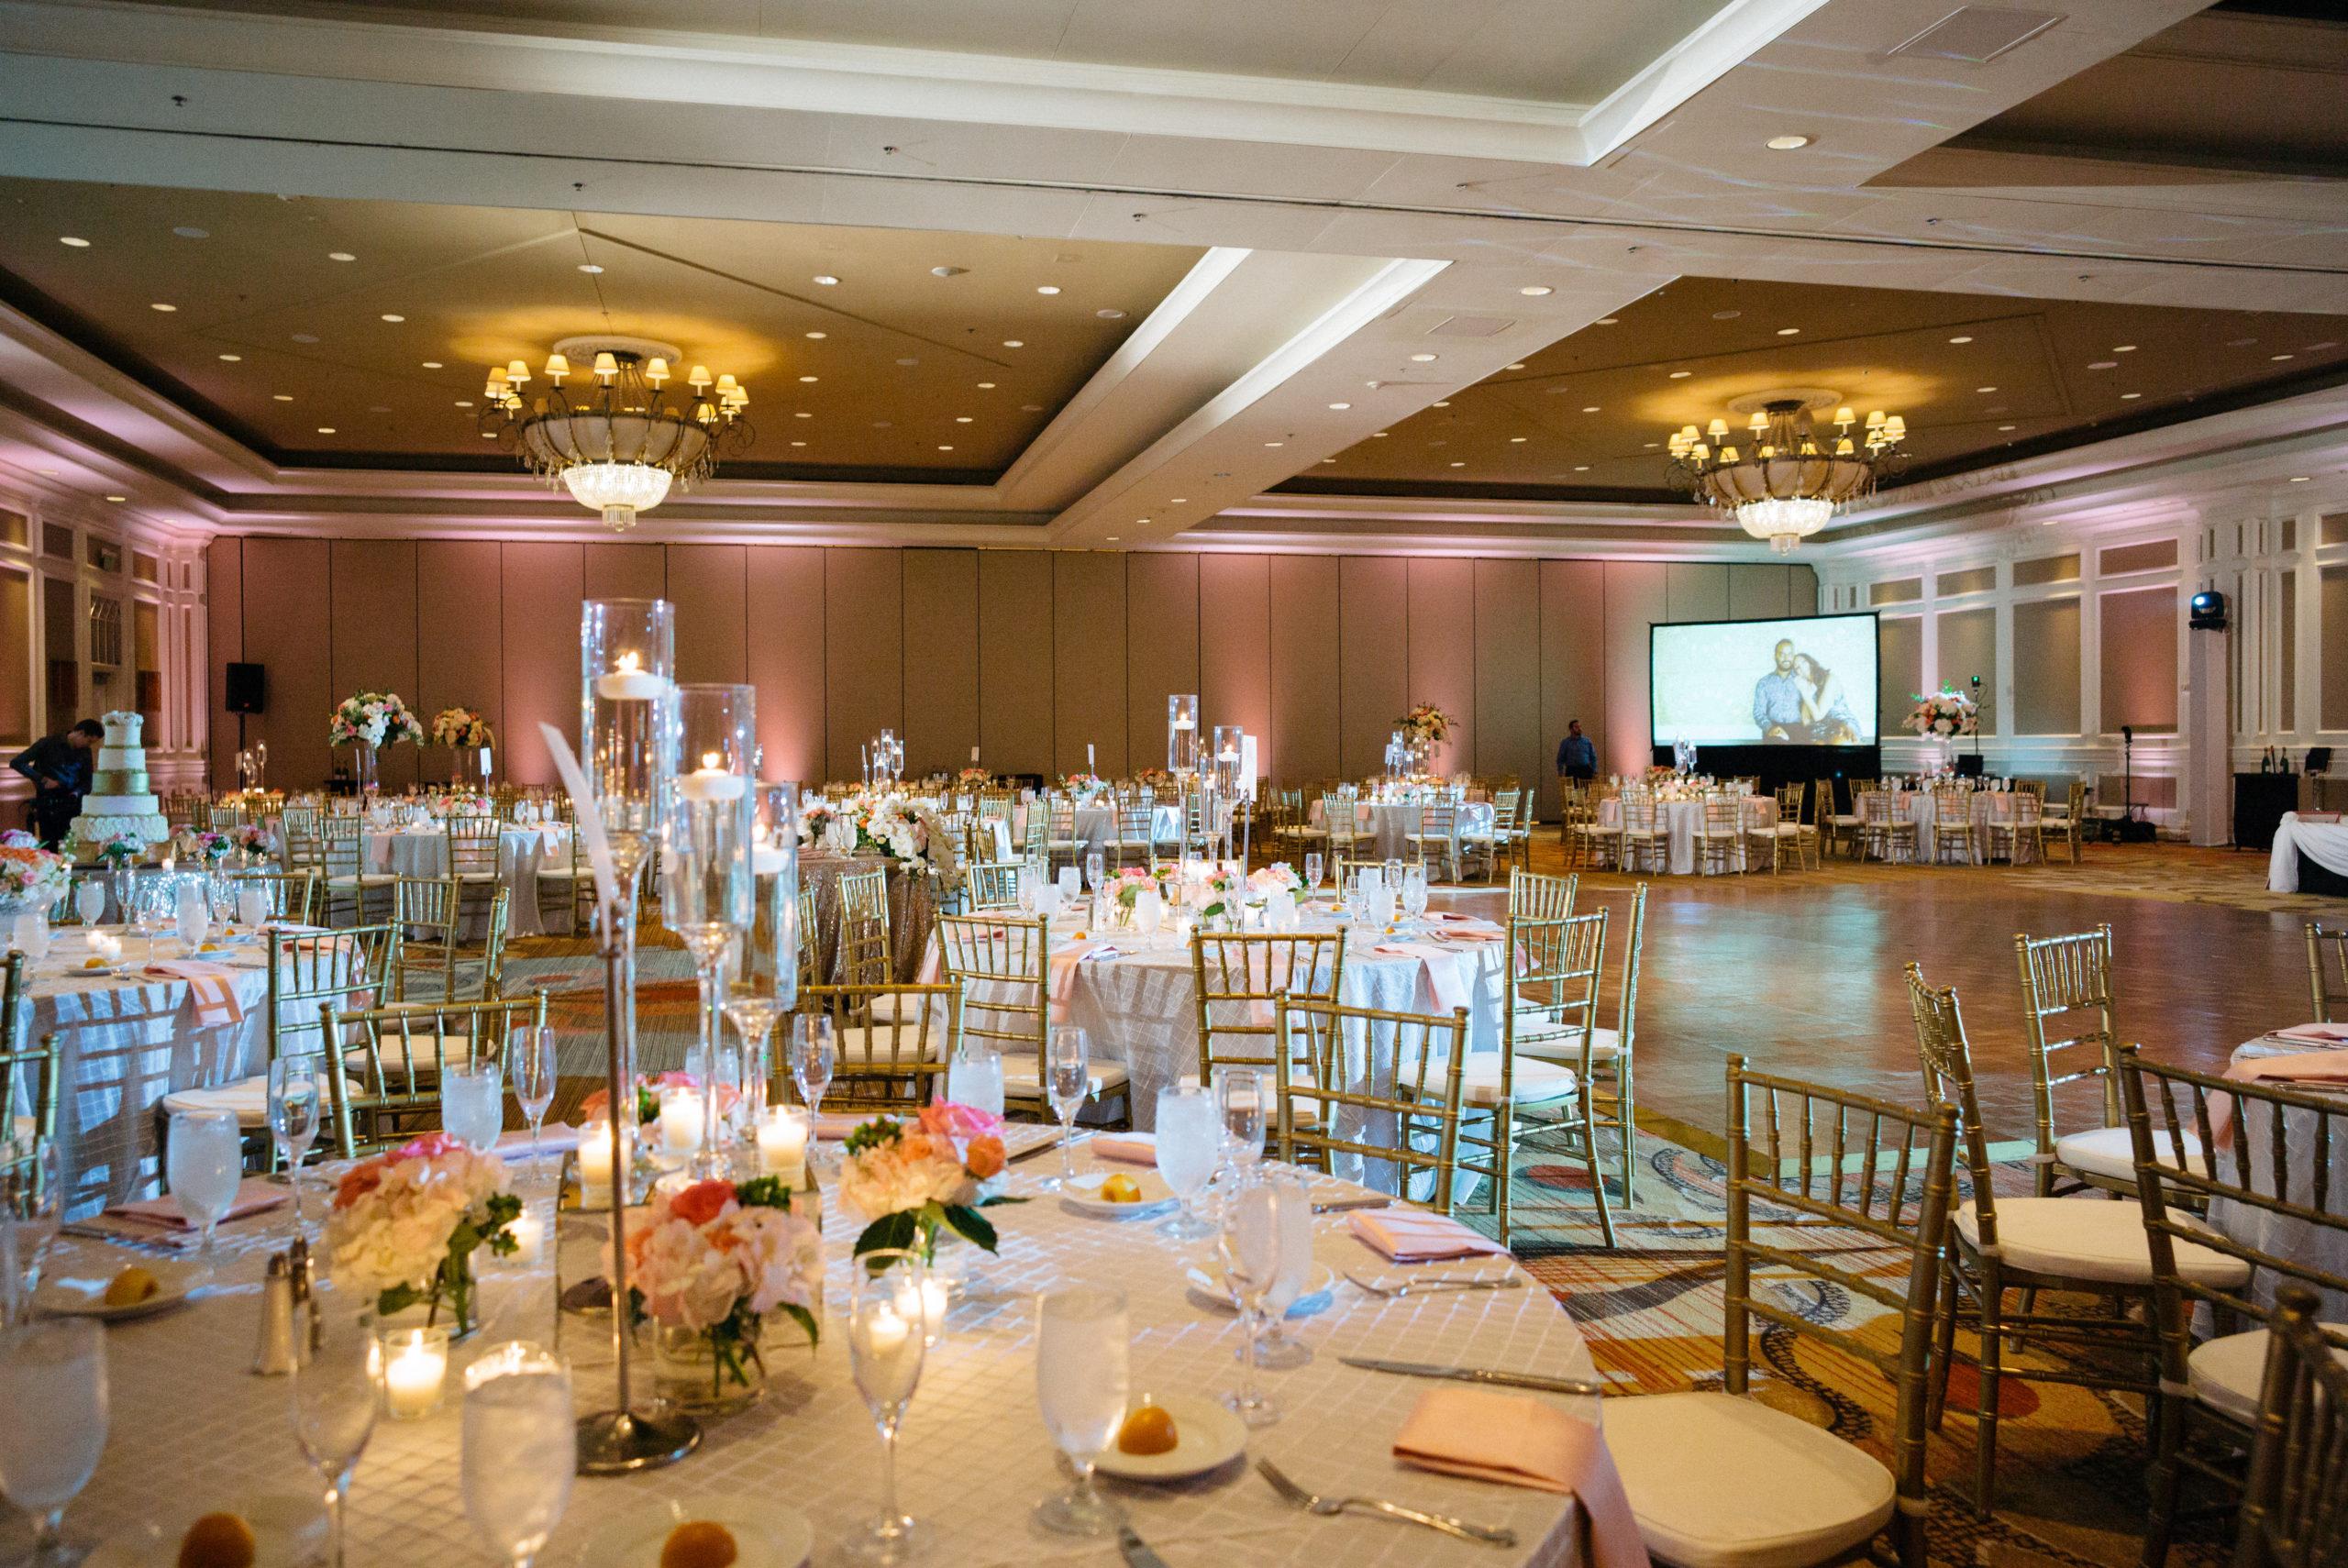 Room decor at hotel Hindu Jewish fusion wedding Sugar Land Marriott Hotel Texas-077